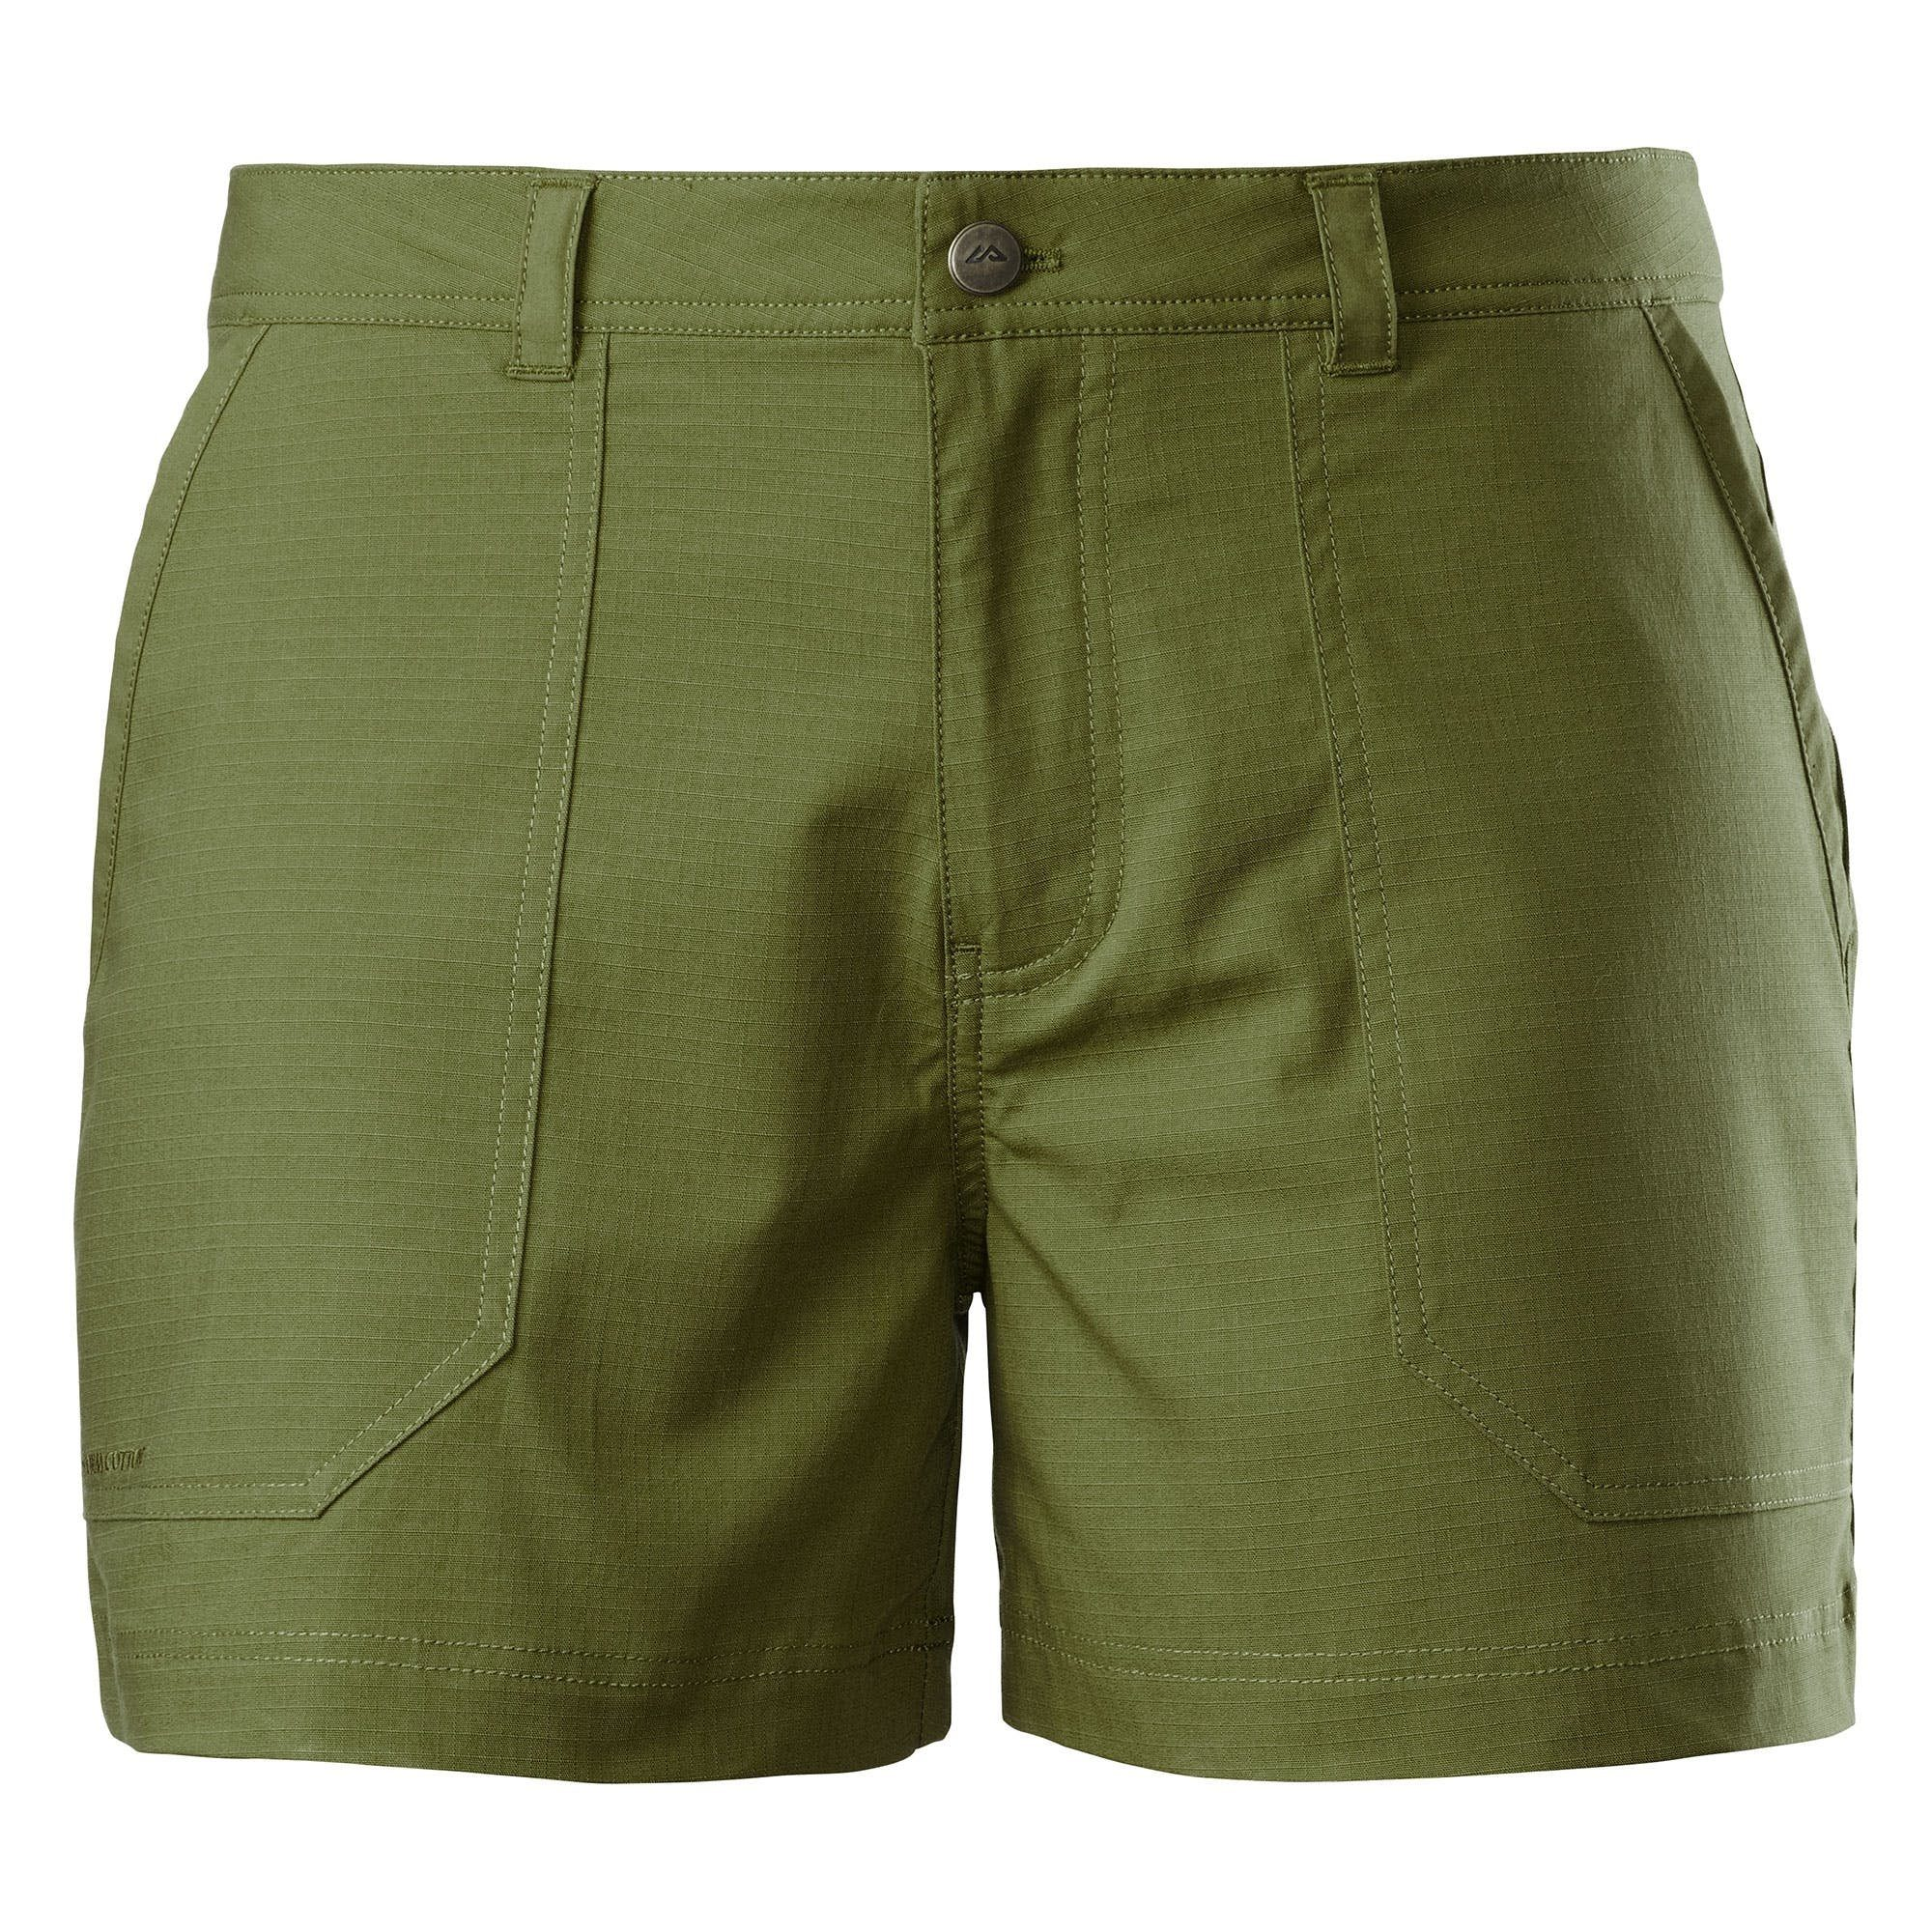 Damen Kathmandu Shorts »Nduro« blau, grün | 09419788853615